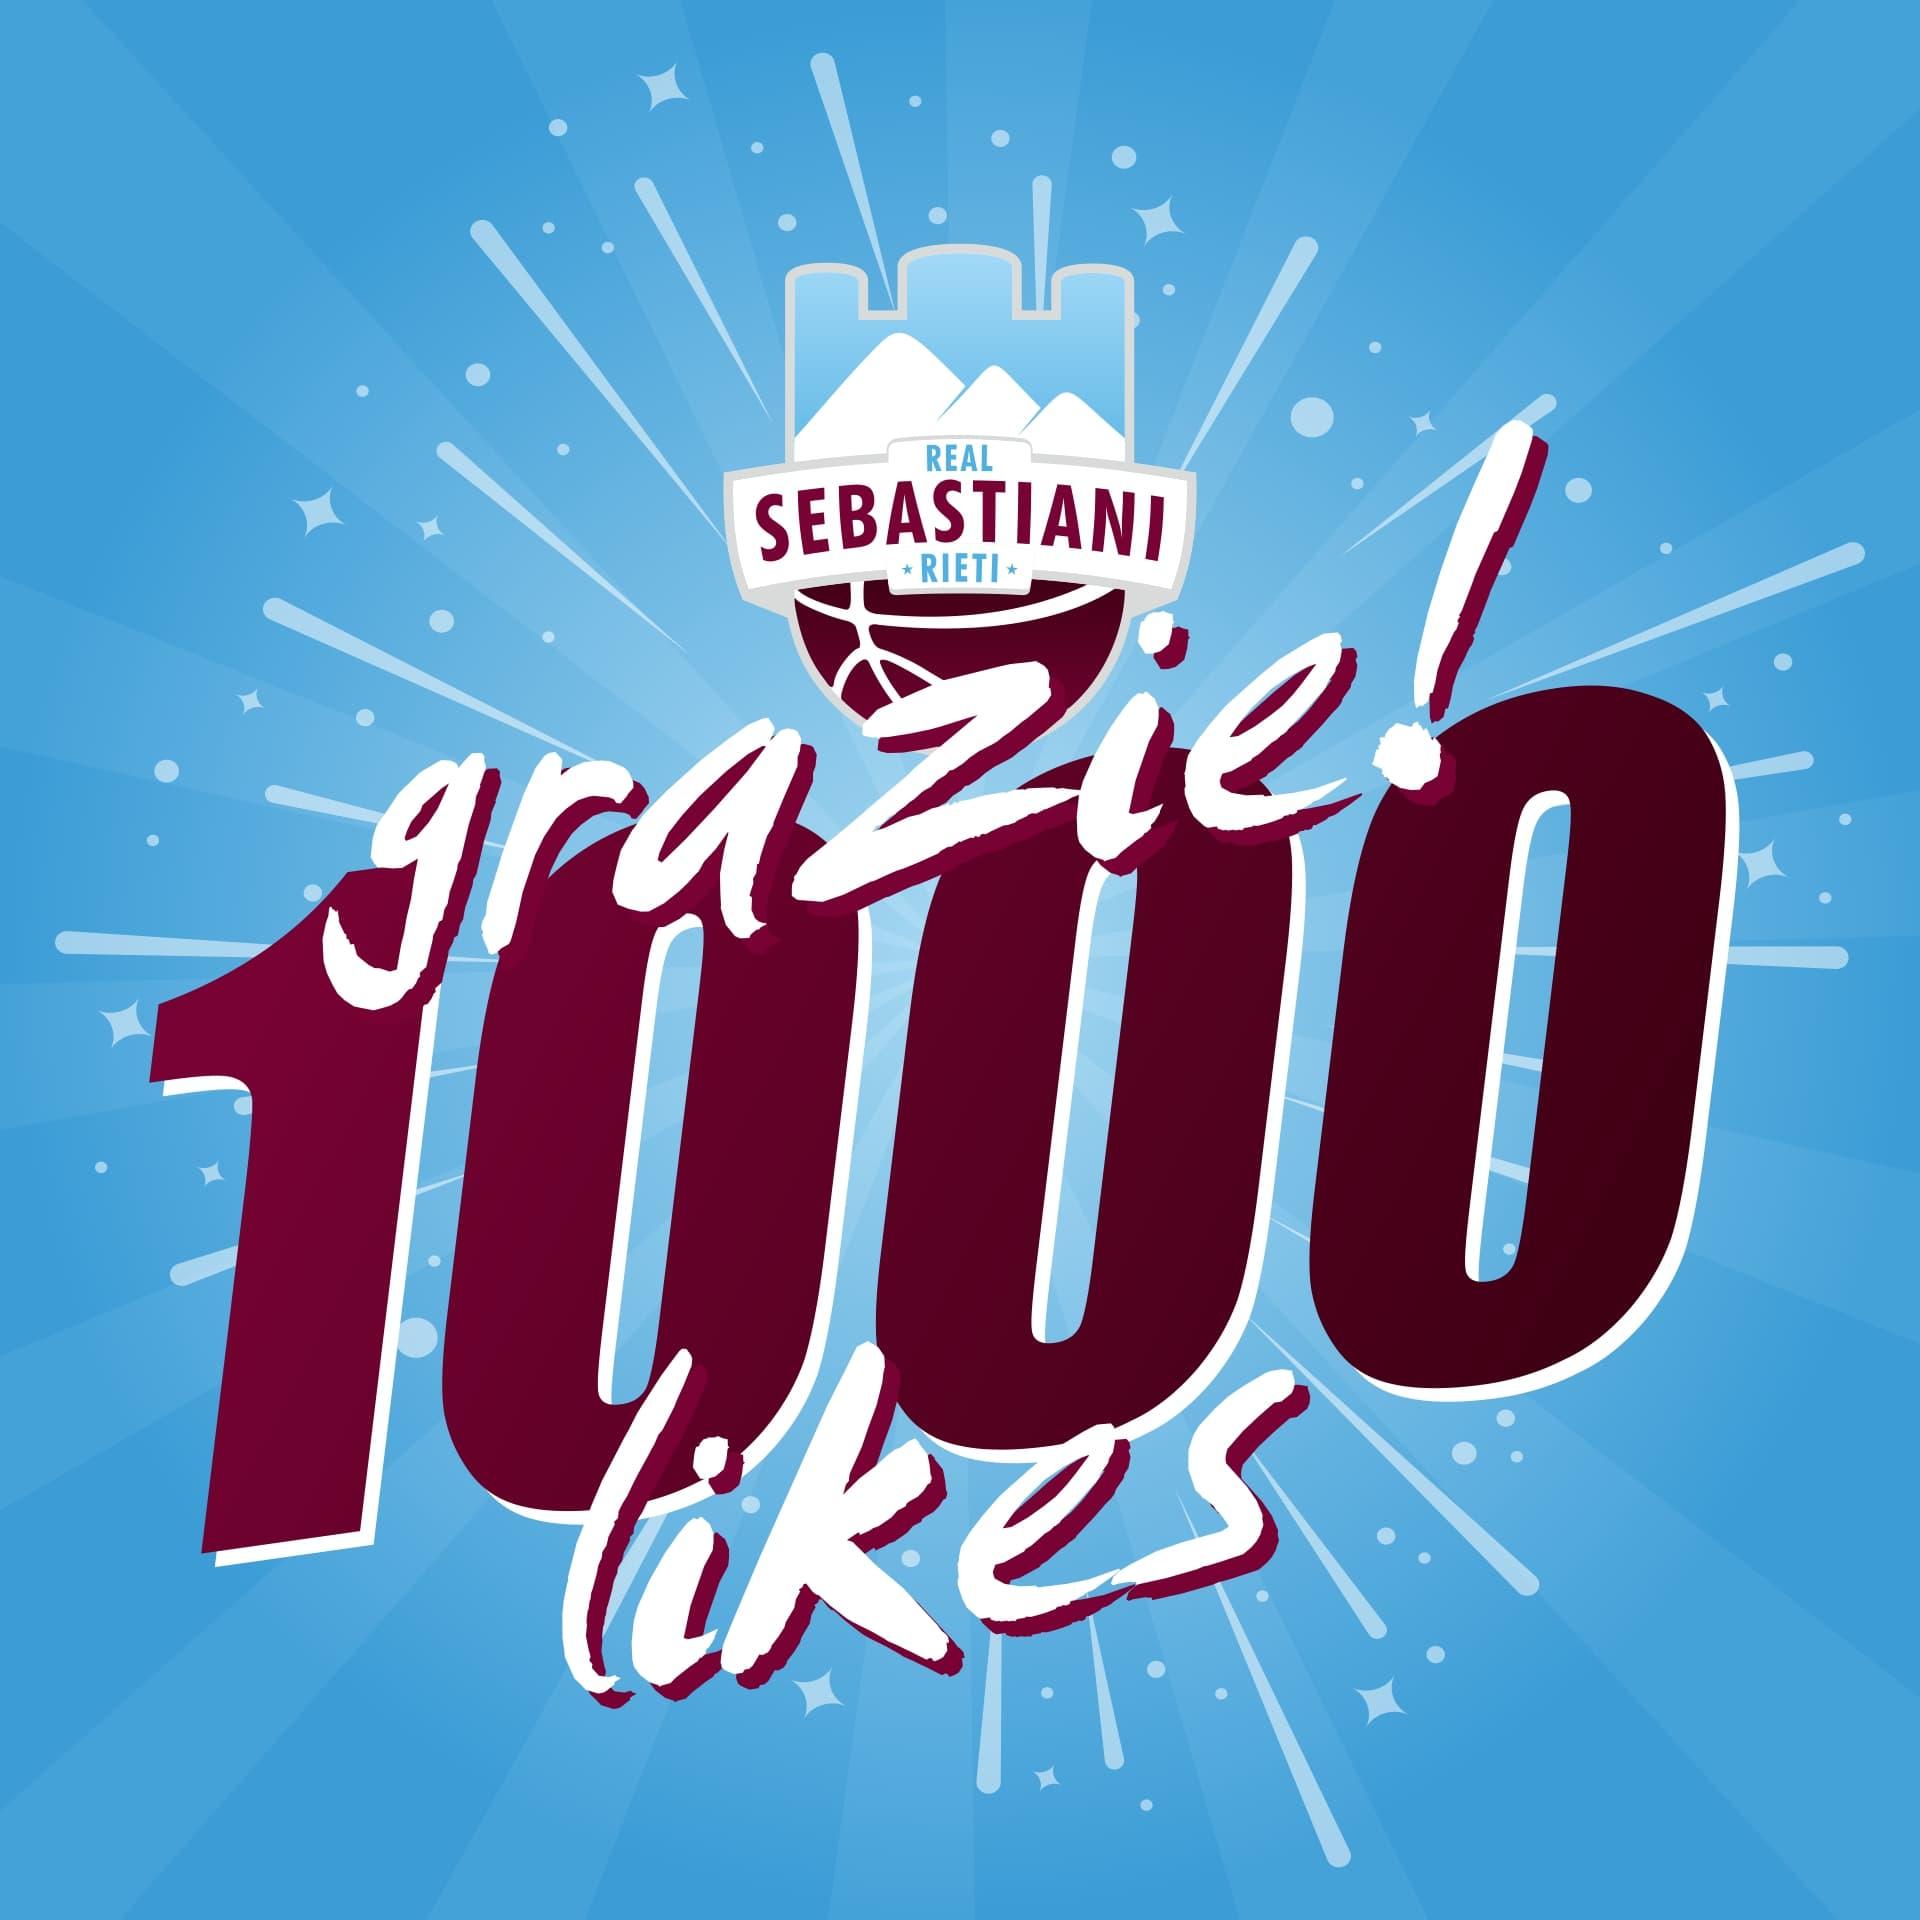 Real Sebastiani Rieti 1000 likes